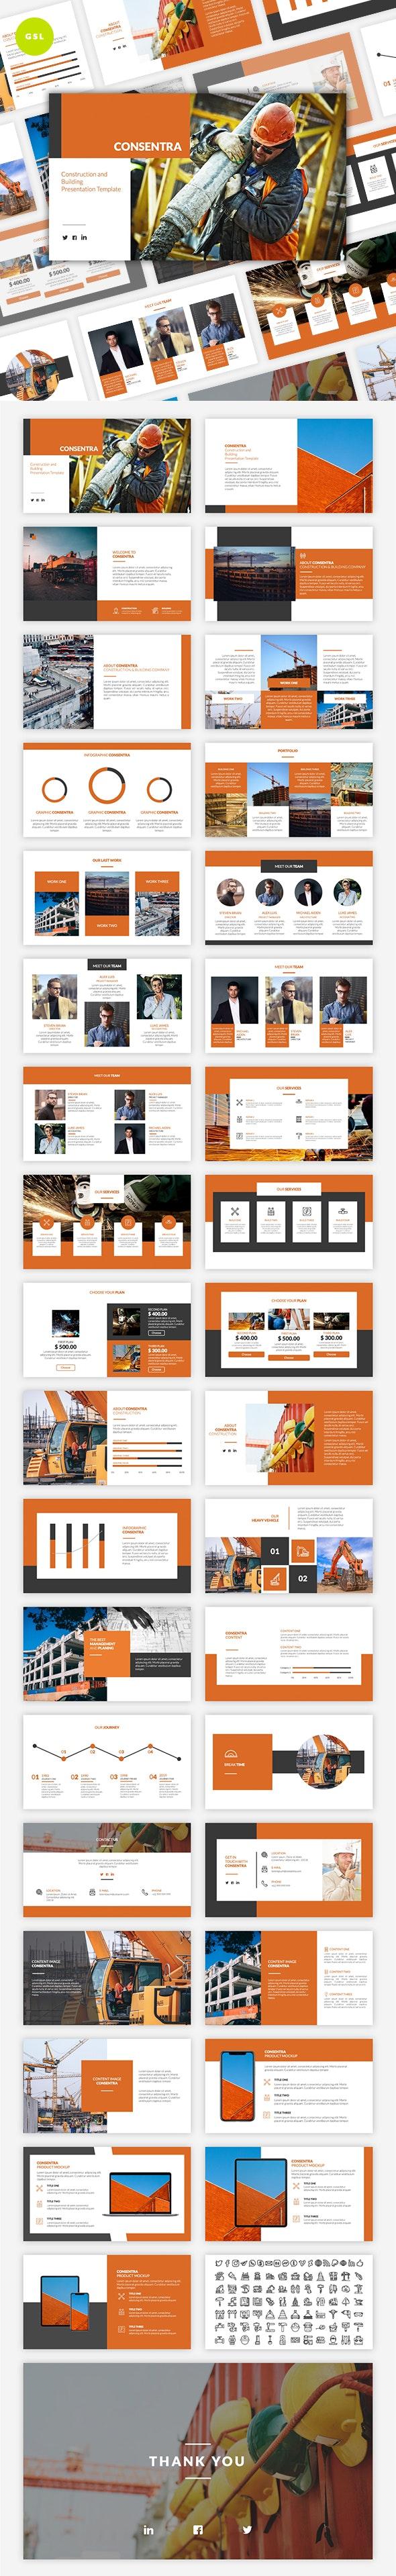 Consentra - Construction & Building Google Slides Template - Google Slides Presentation Templates